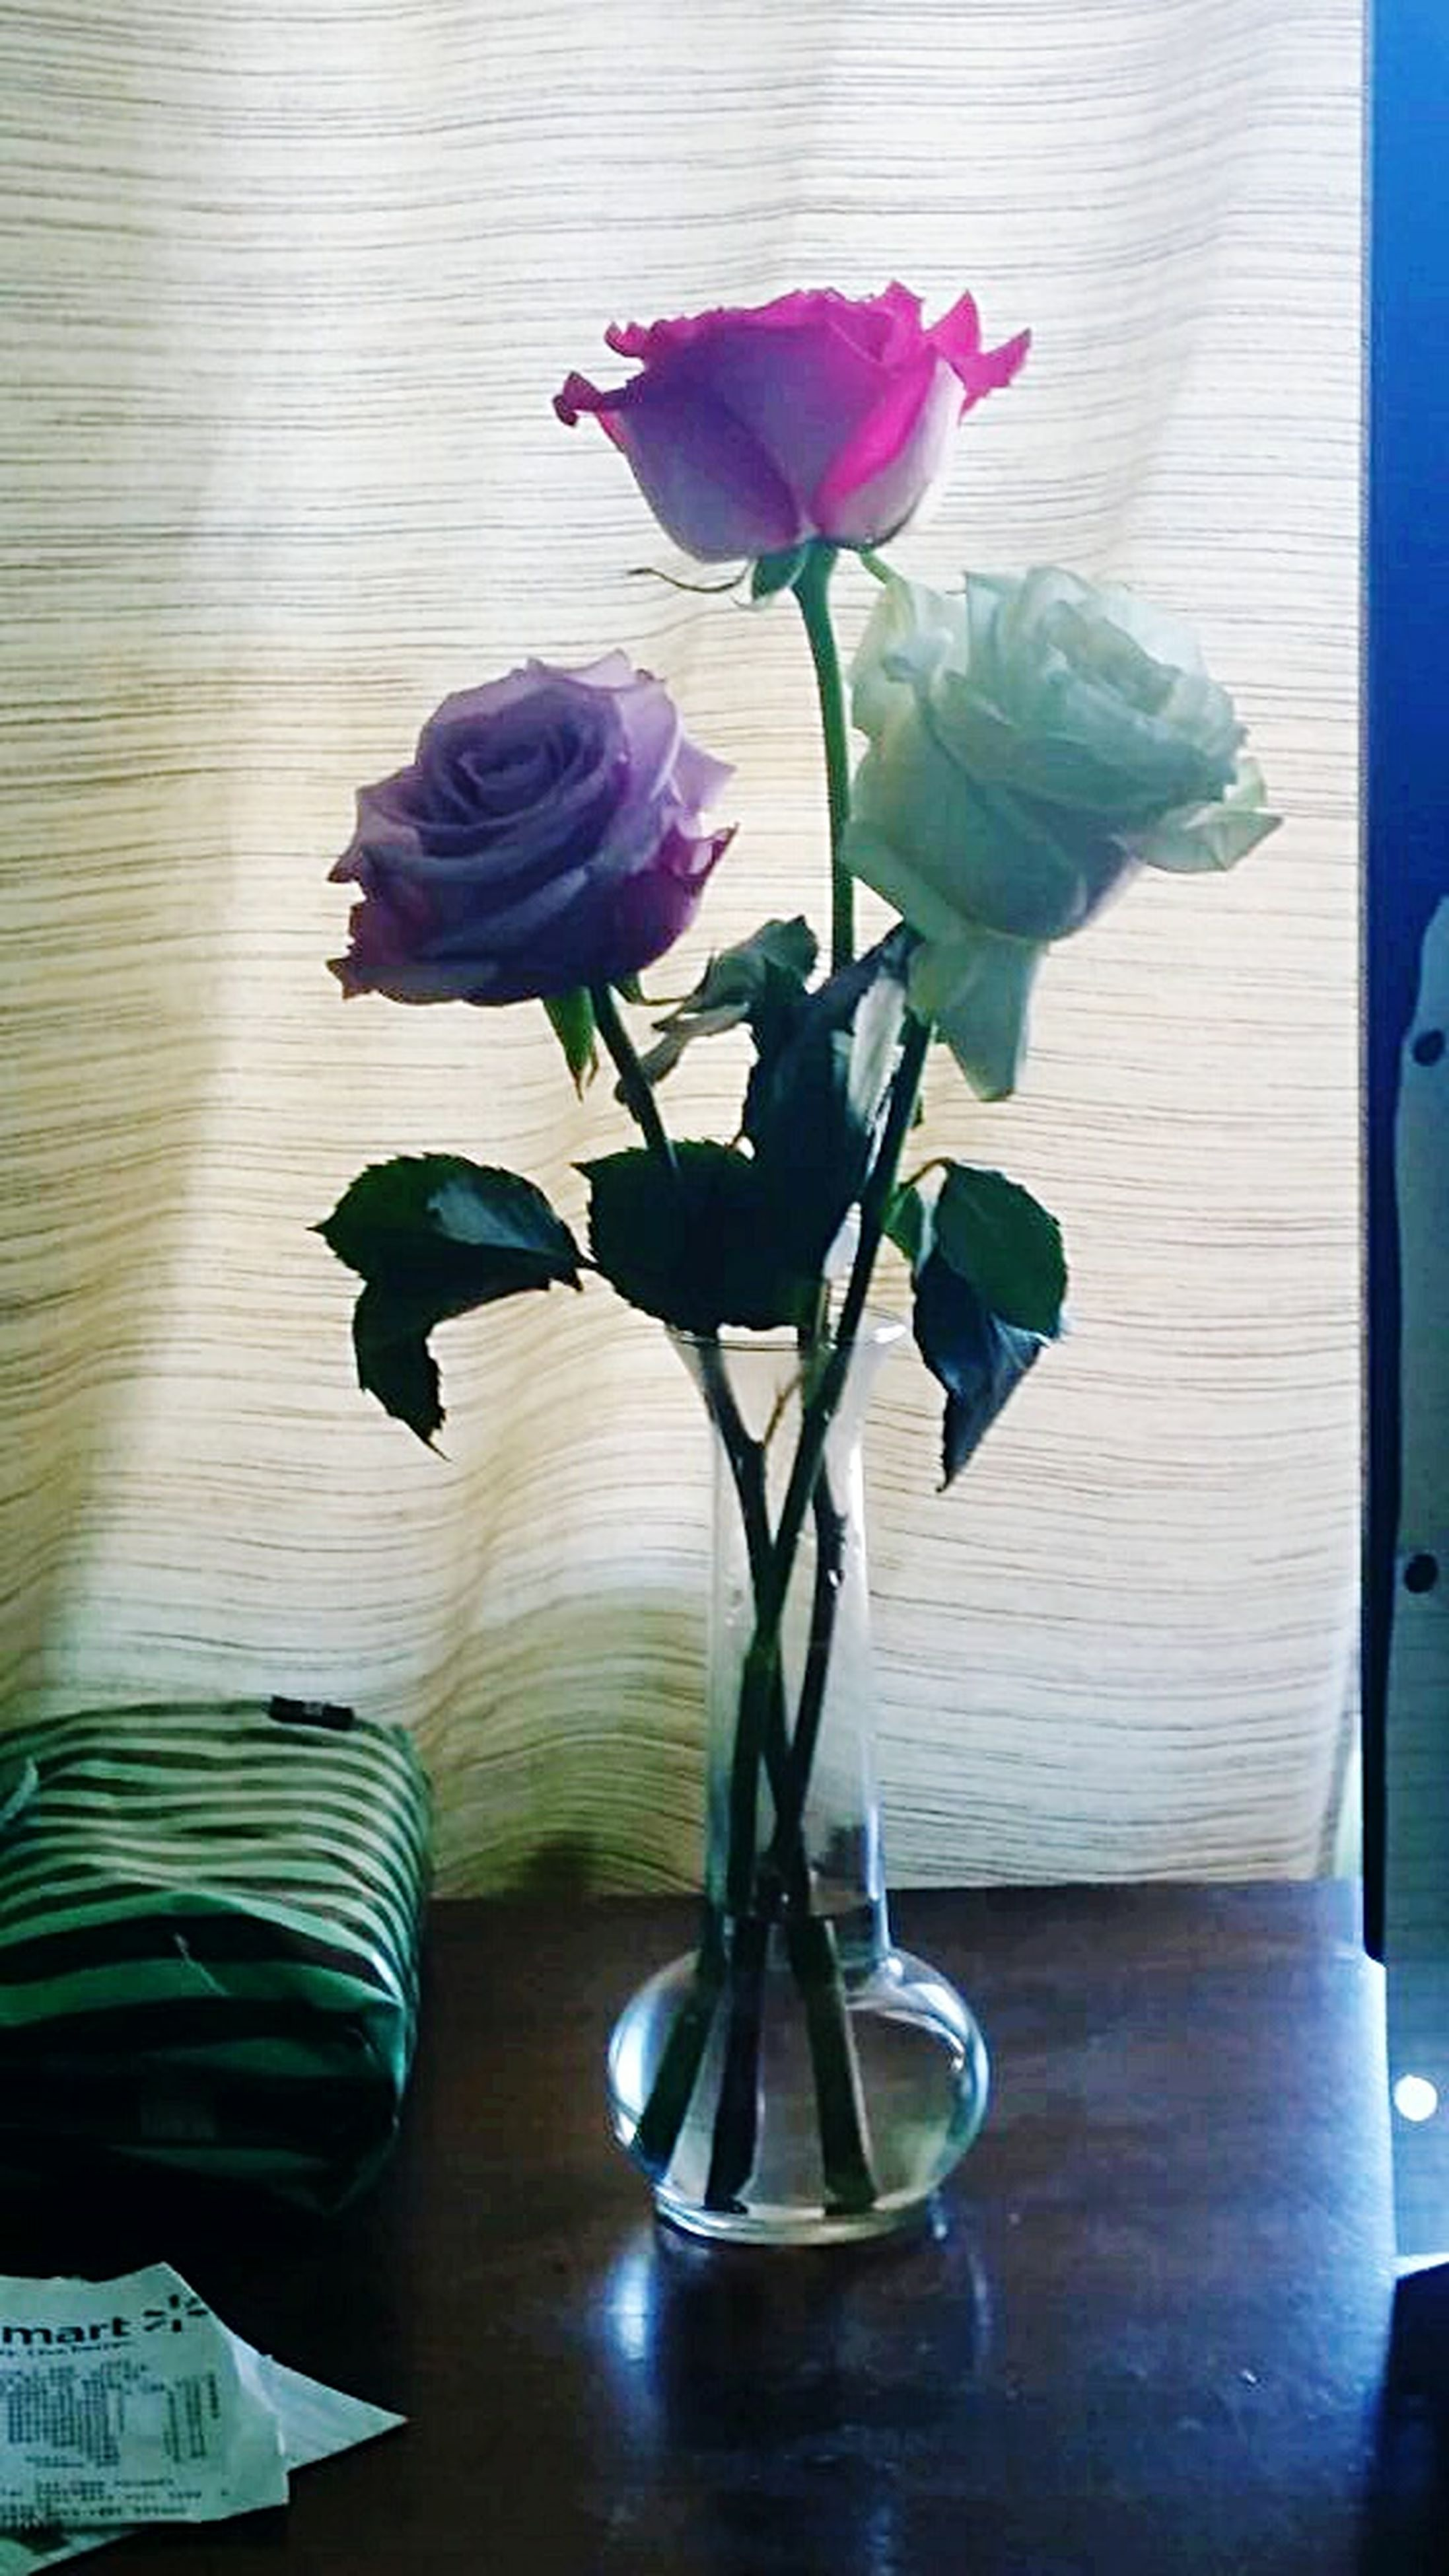 flower, indoors, vase, freshness, table, petal, fragility, leaf, flower head, stem, growth, plant, beauty in nature, potted plant, nature, flower arrangement, close-up, still life, rose - flower, home interior